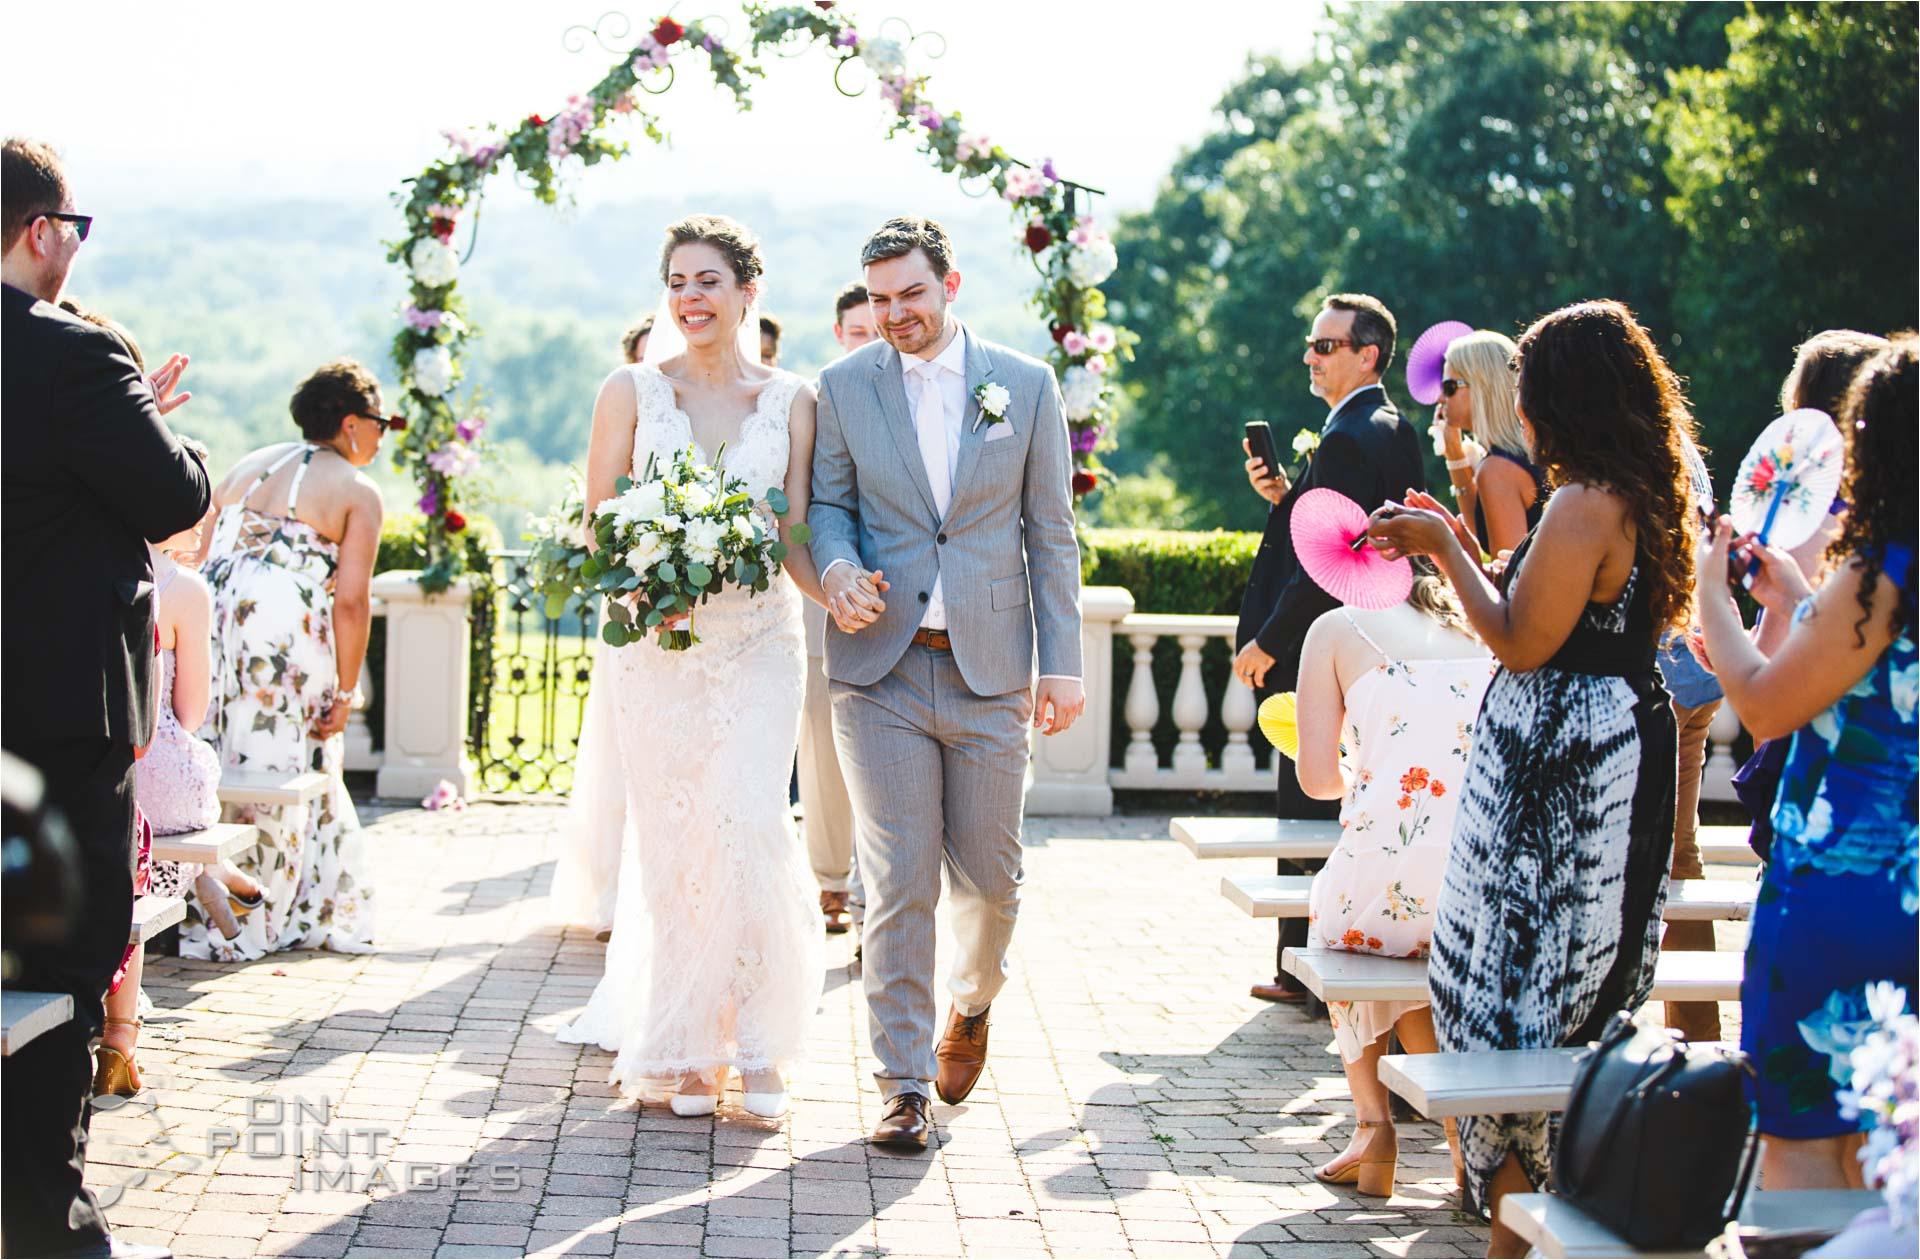 wickham-park-wedding-photographer-ct-25.jpg